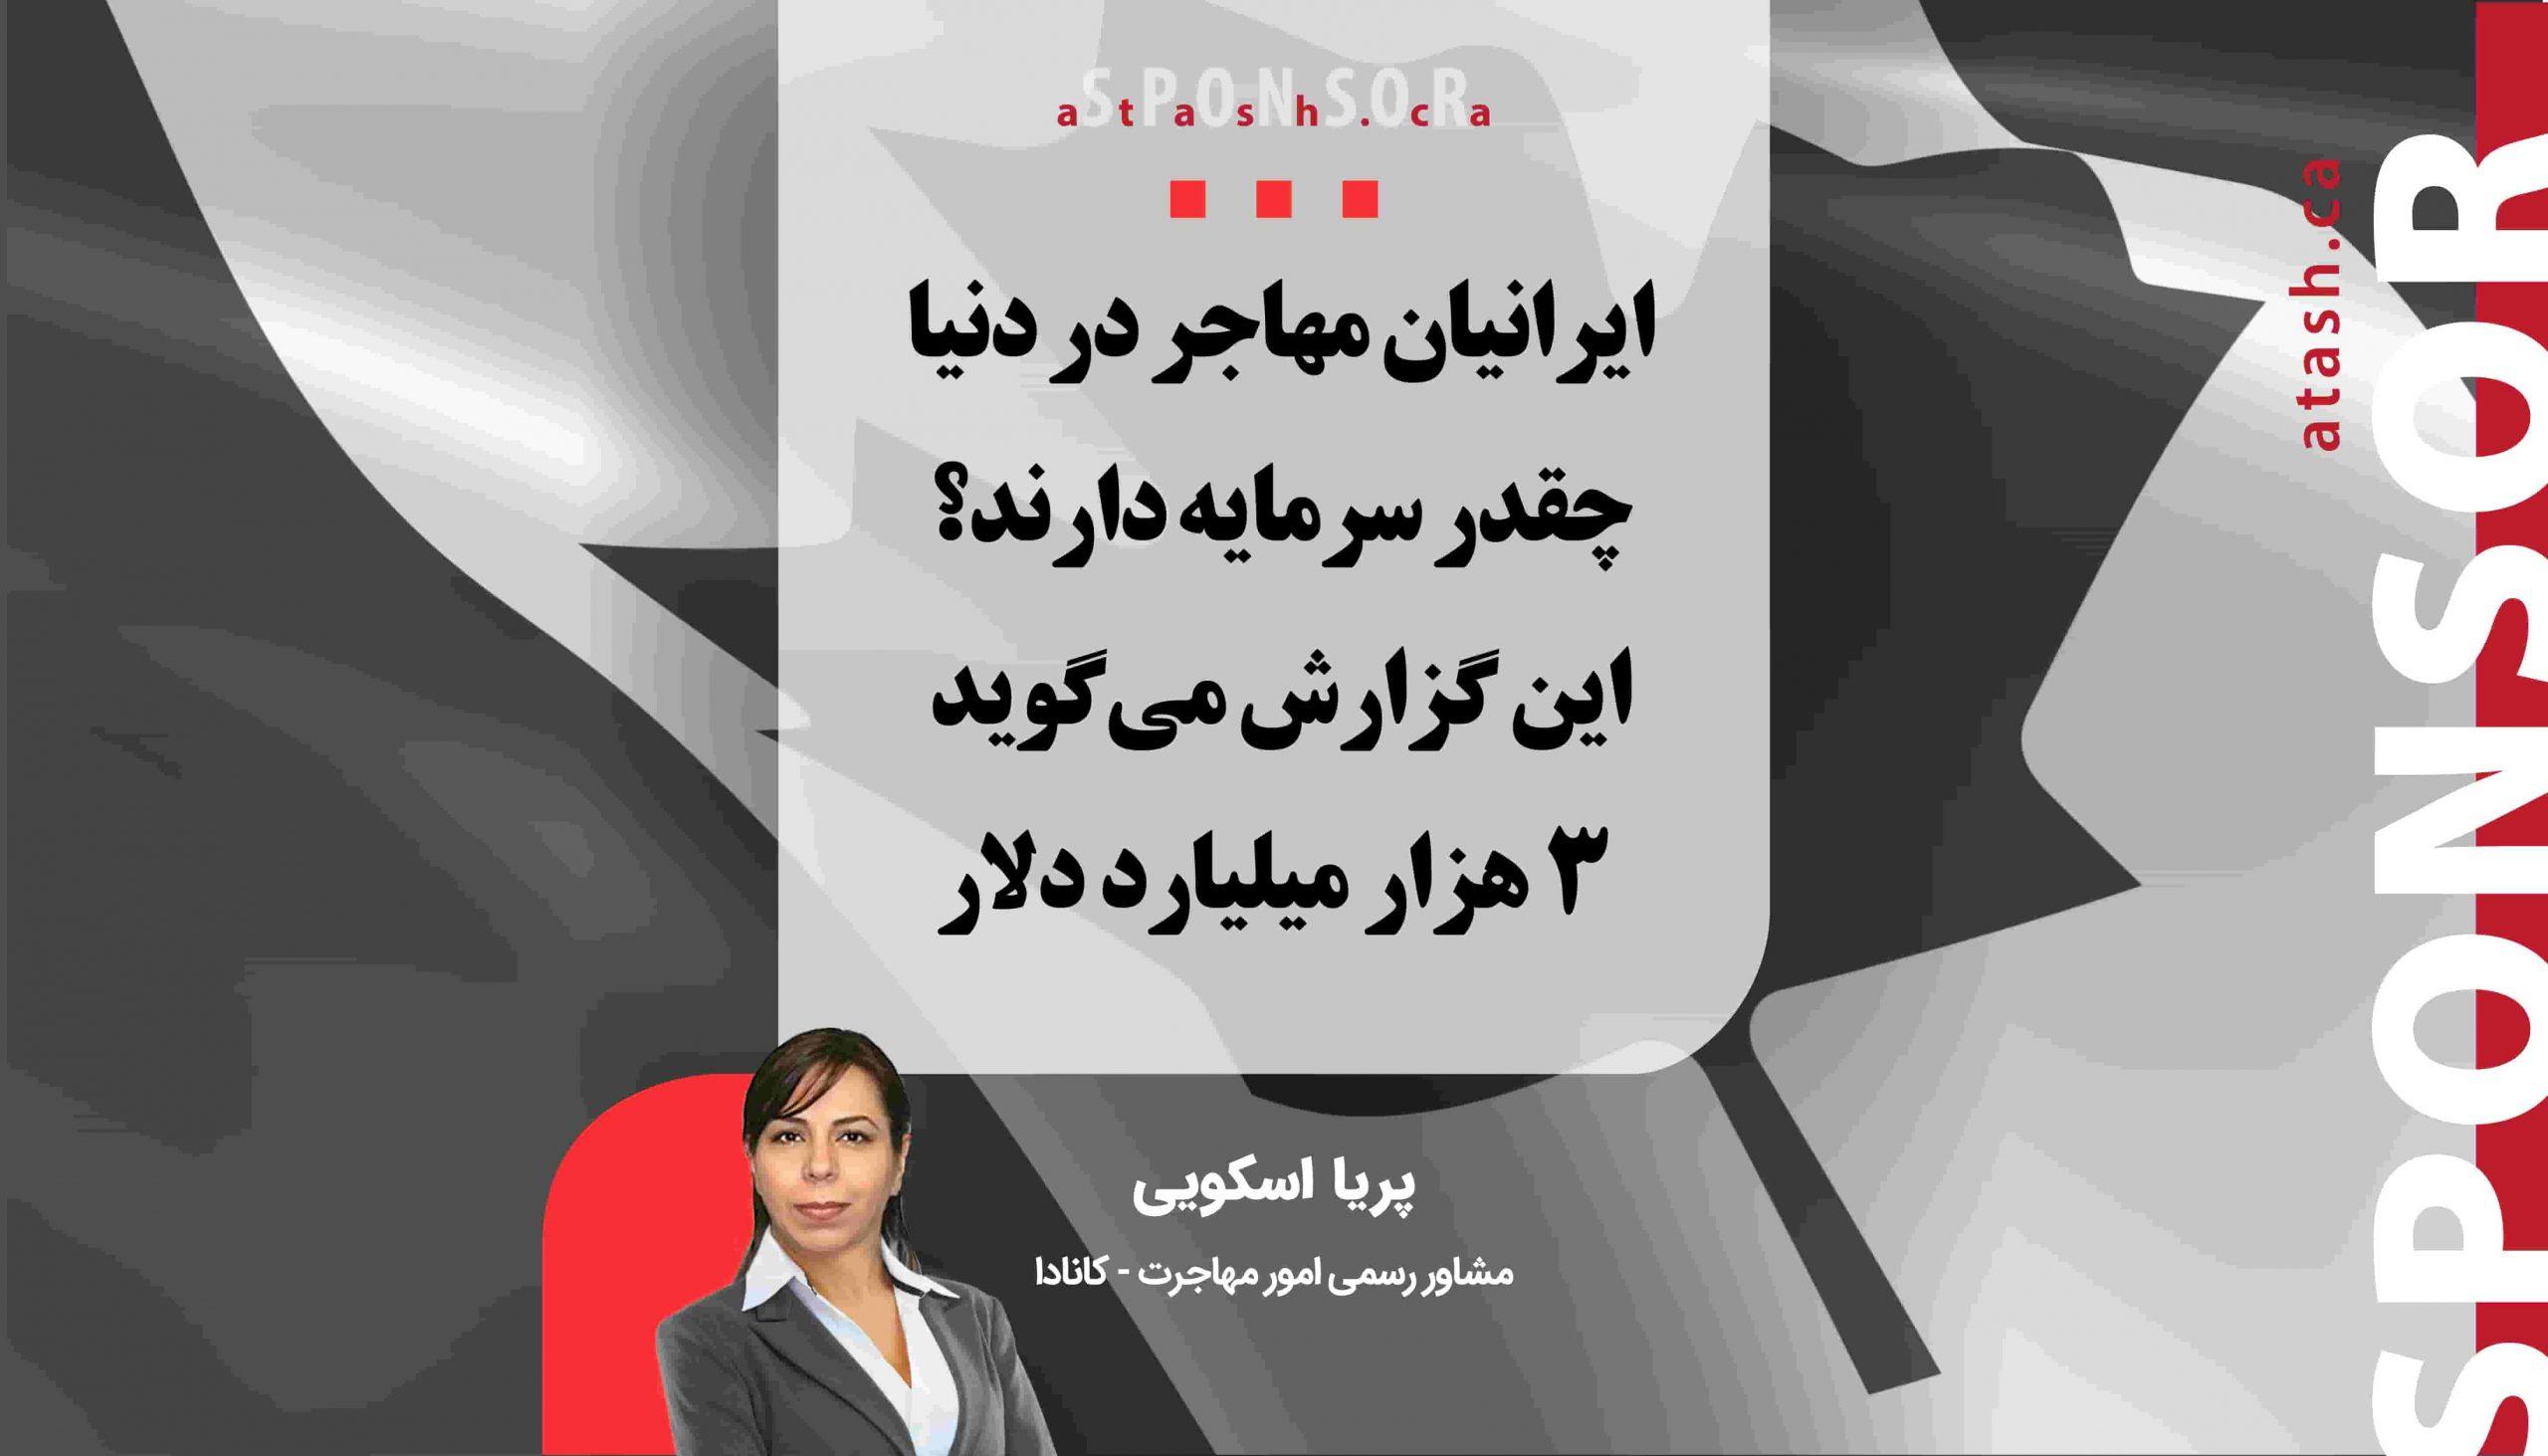 Photo of ایرانیان مهاجر در دنیا چقدر سرمایه دارند؟ این گزارش میگوید ۳ هزار میلیارد دلار